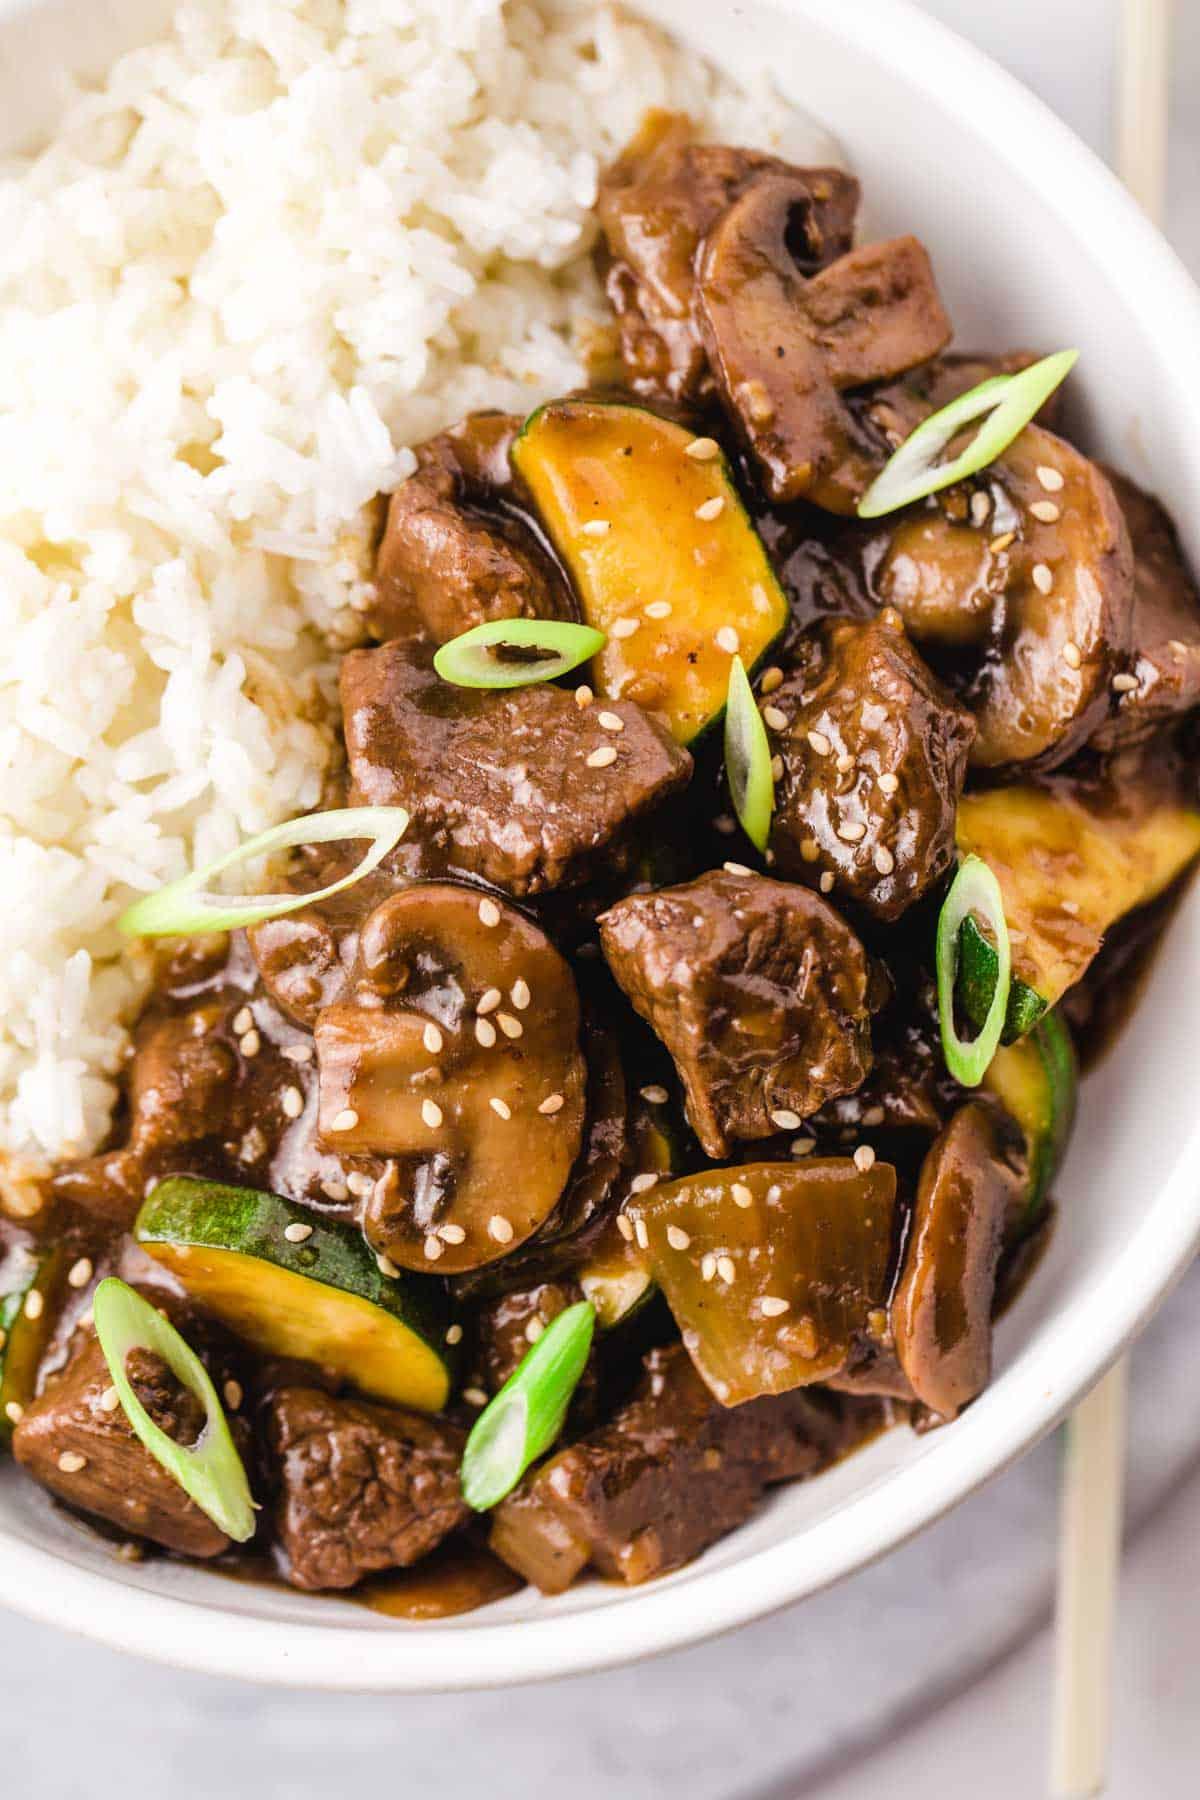 Hibachi steak over jasmine rice in a white bowl